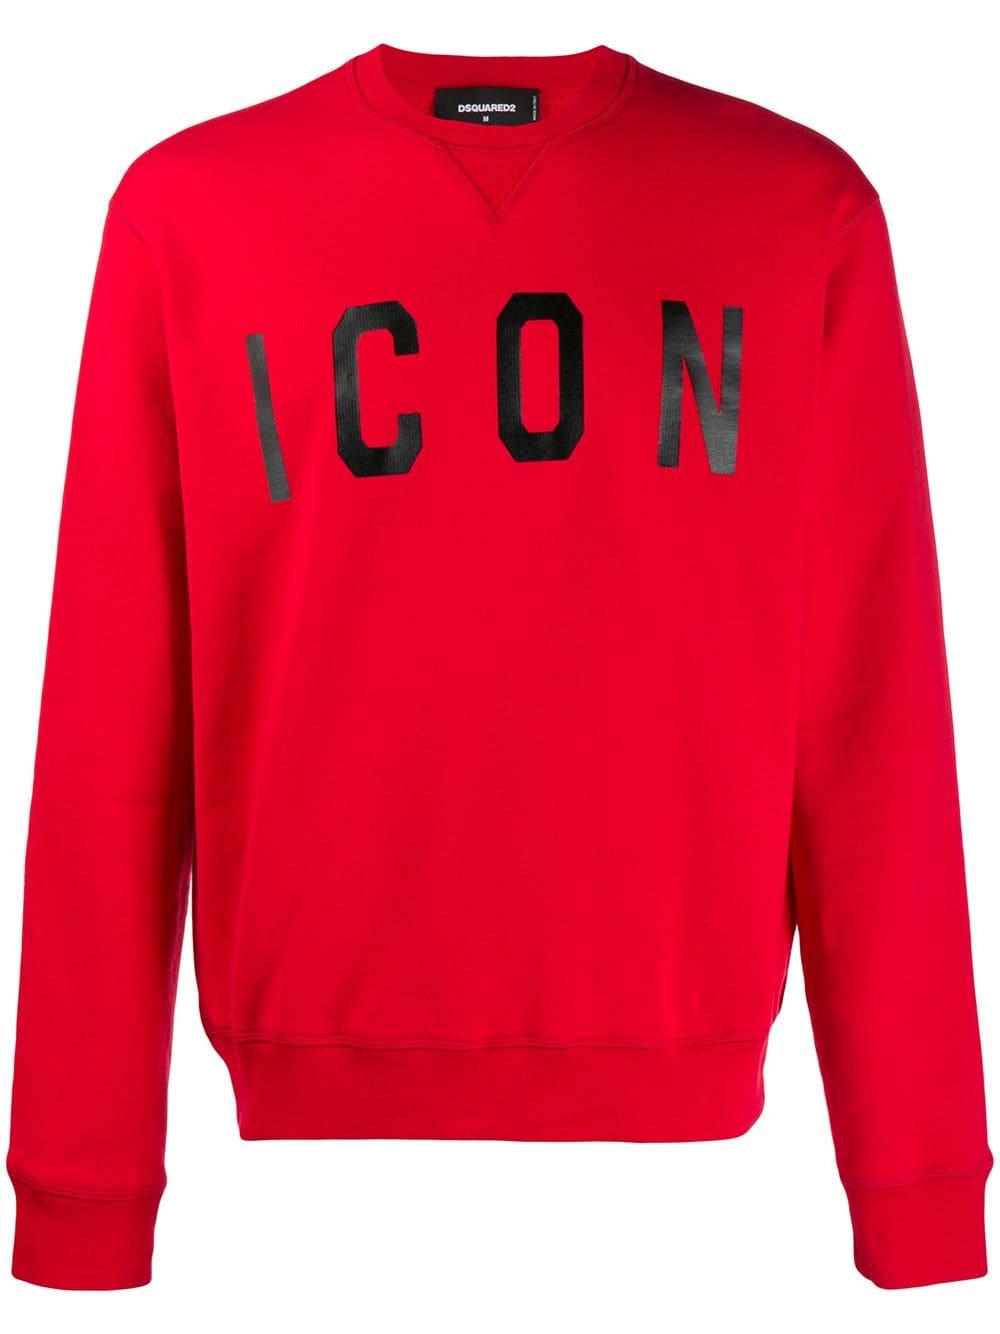 Dsquared2 Cool Fit Icon Graphic Sweatshirt In 970 Redblk Modesens Sweatshirts Dsquared2 Printed Sweatshirts [ 1334 x 1000 Pixel ]